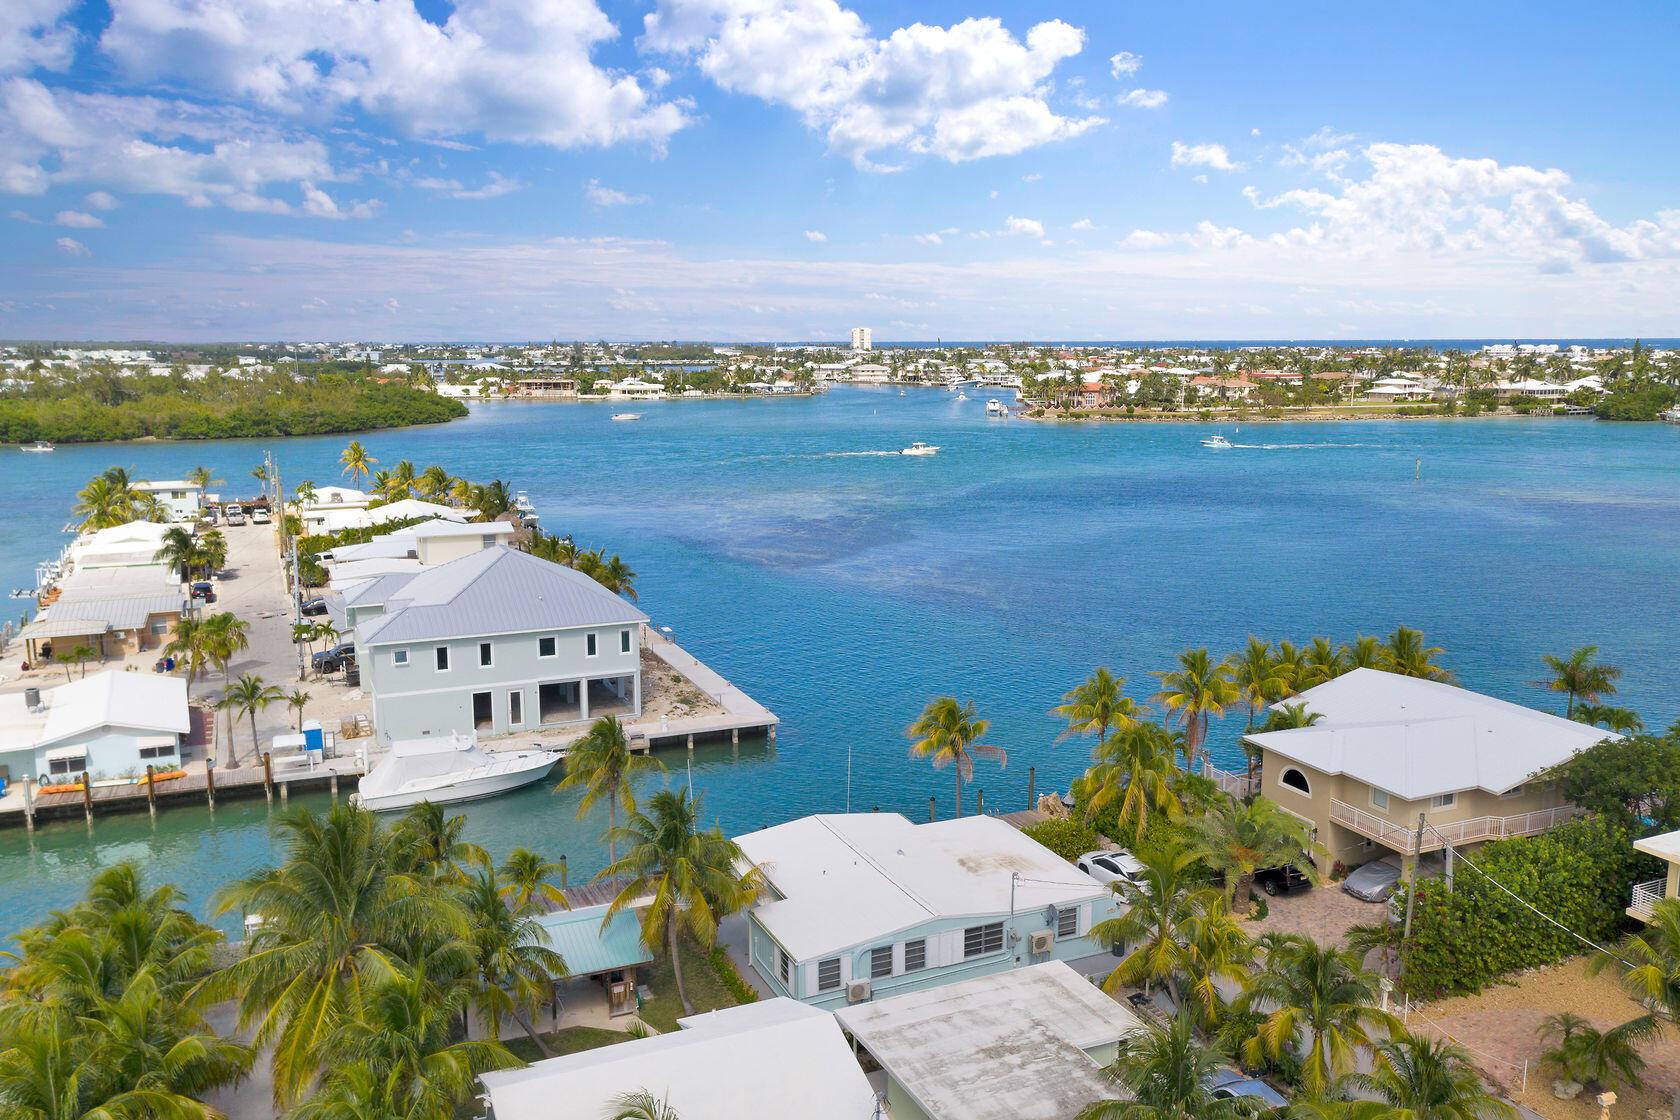 11688 6th Avenue Ocean #ocean Property Photo 1